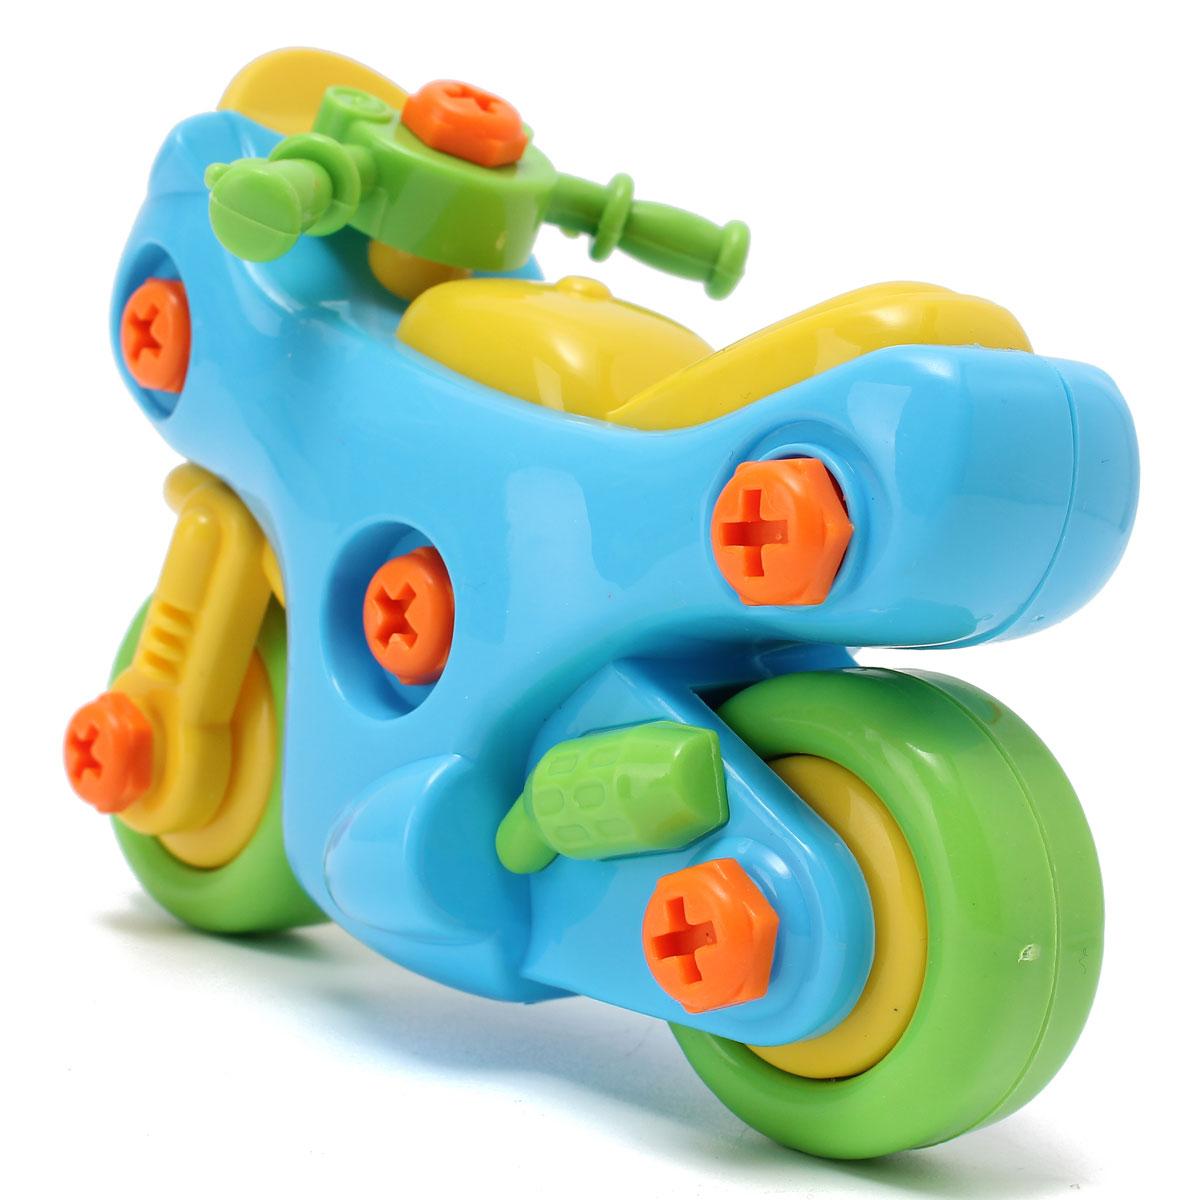 Boy Games Toy : Motocycle shape kids child baby boy disassembly assembly